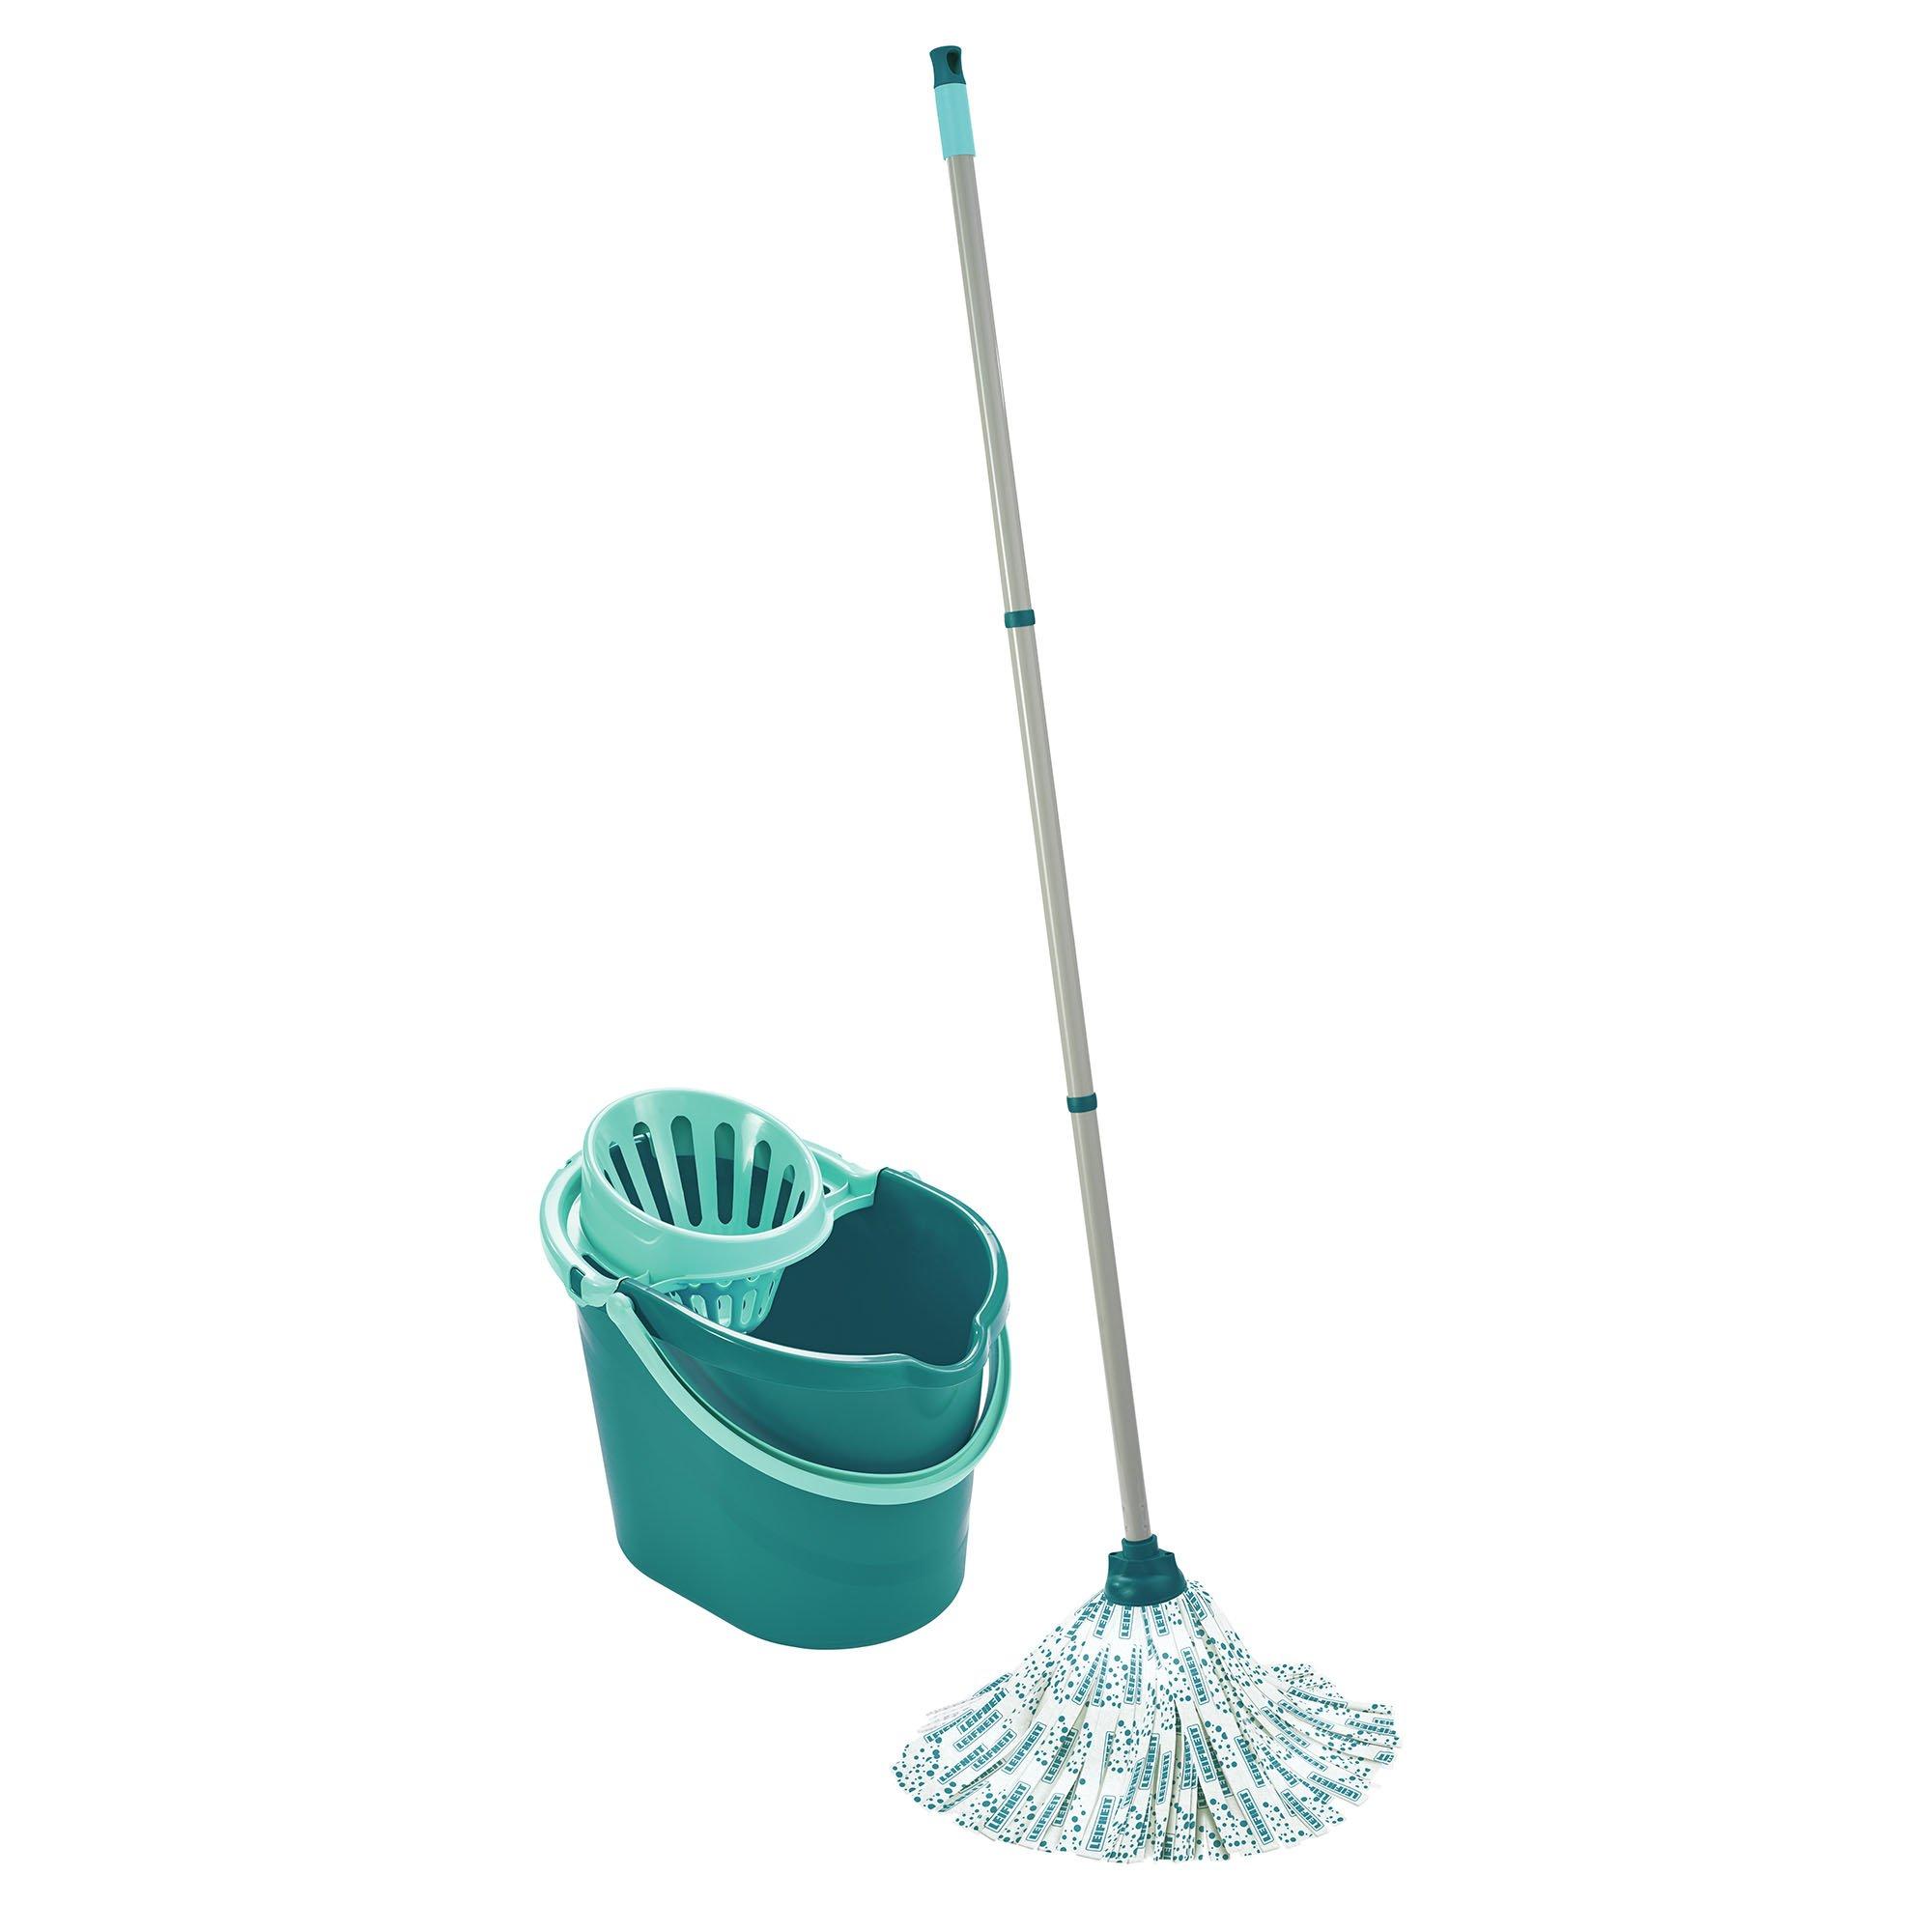 Leifheit 56792-1 Classic Mop and Bucket Set